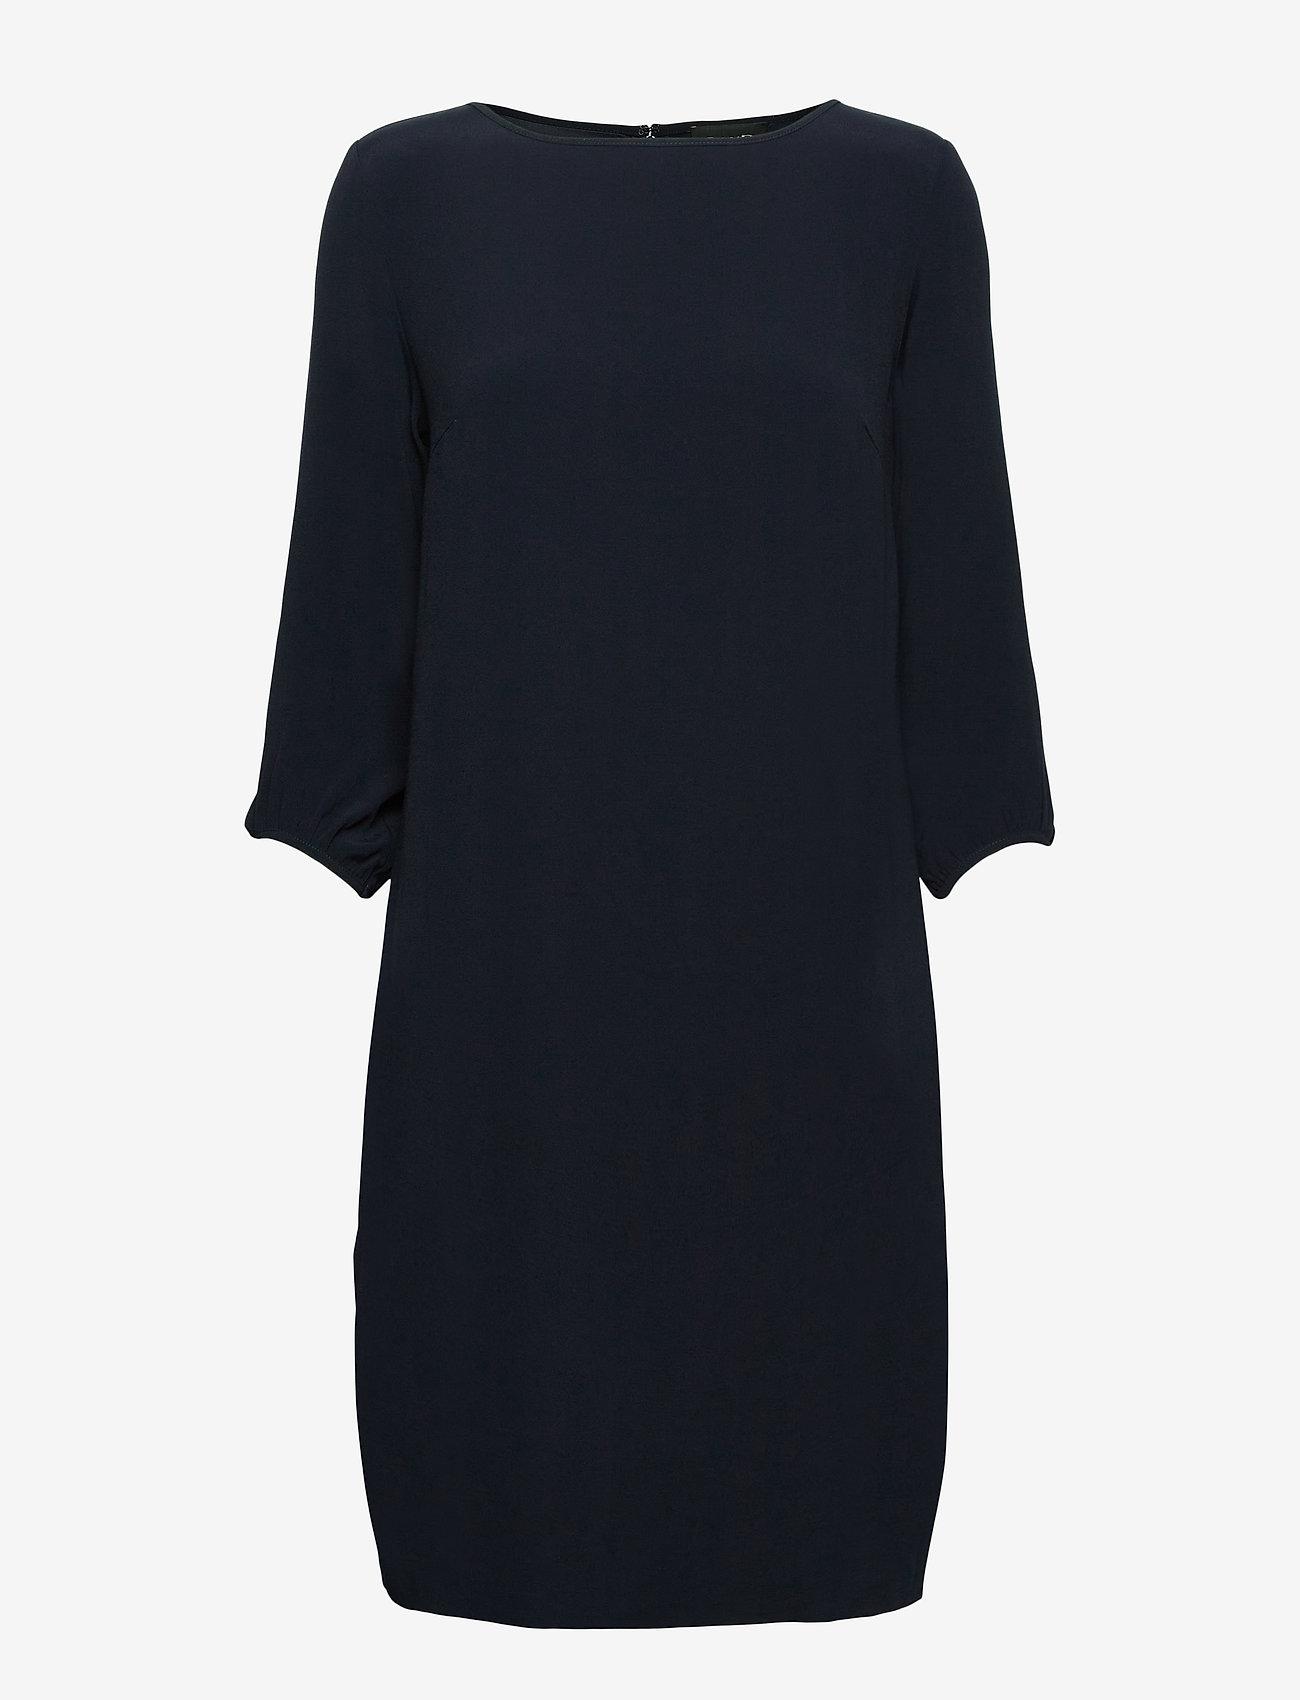 SAND - Crepe Satin Back - Ellie - robes de jour - medium blue - 0